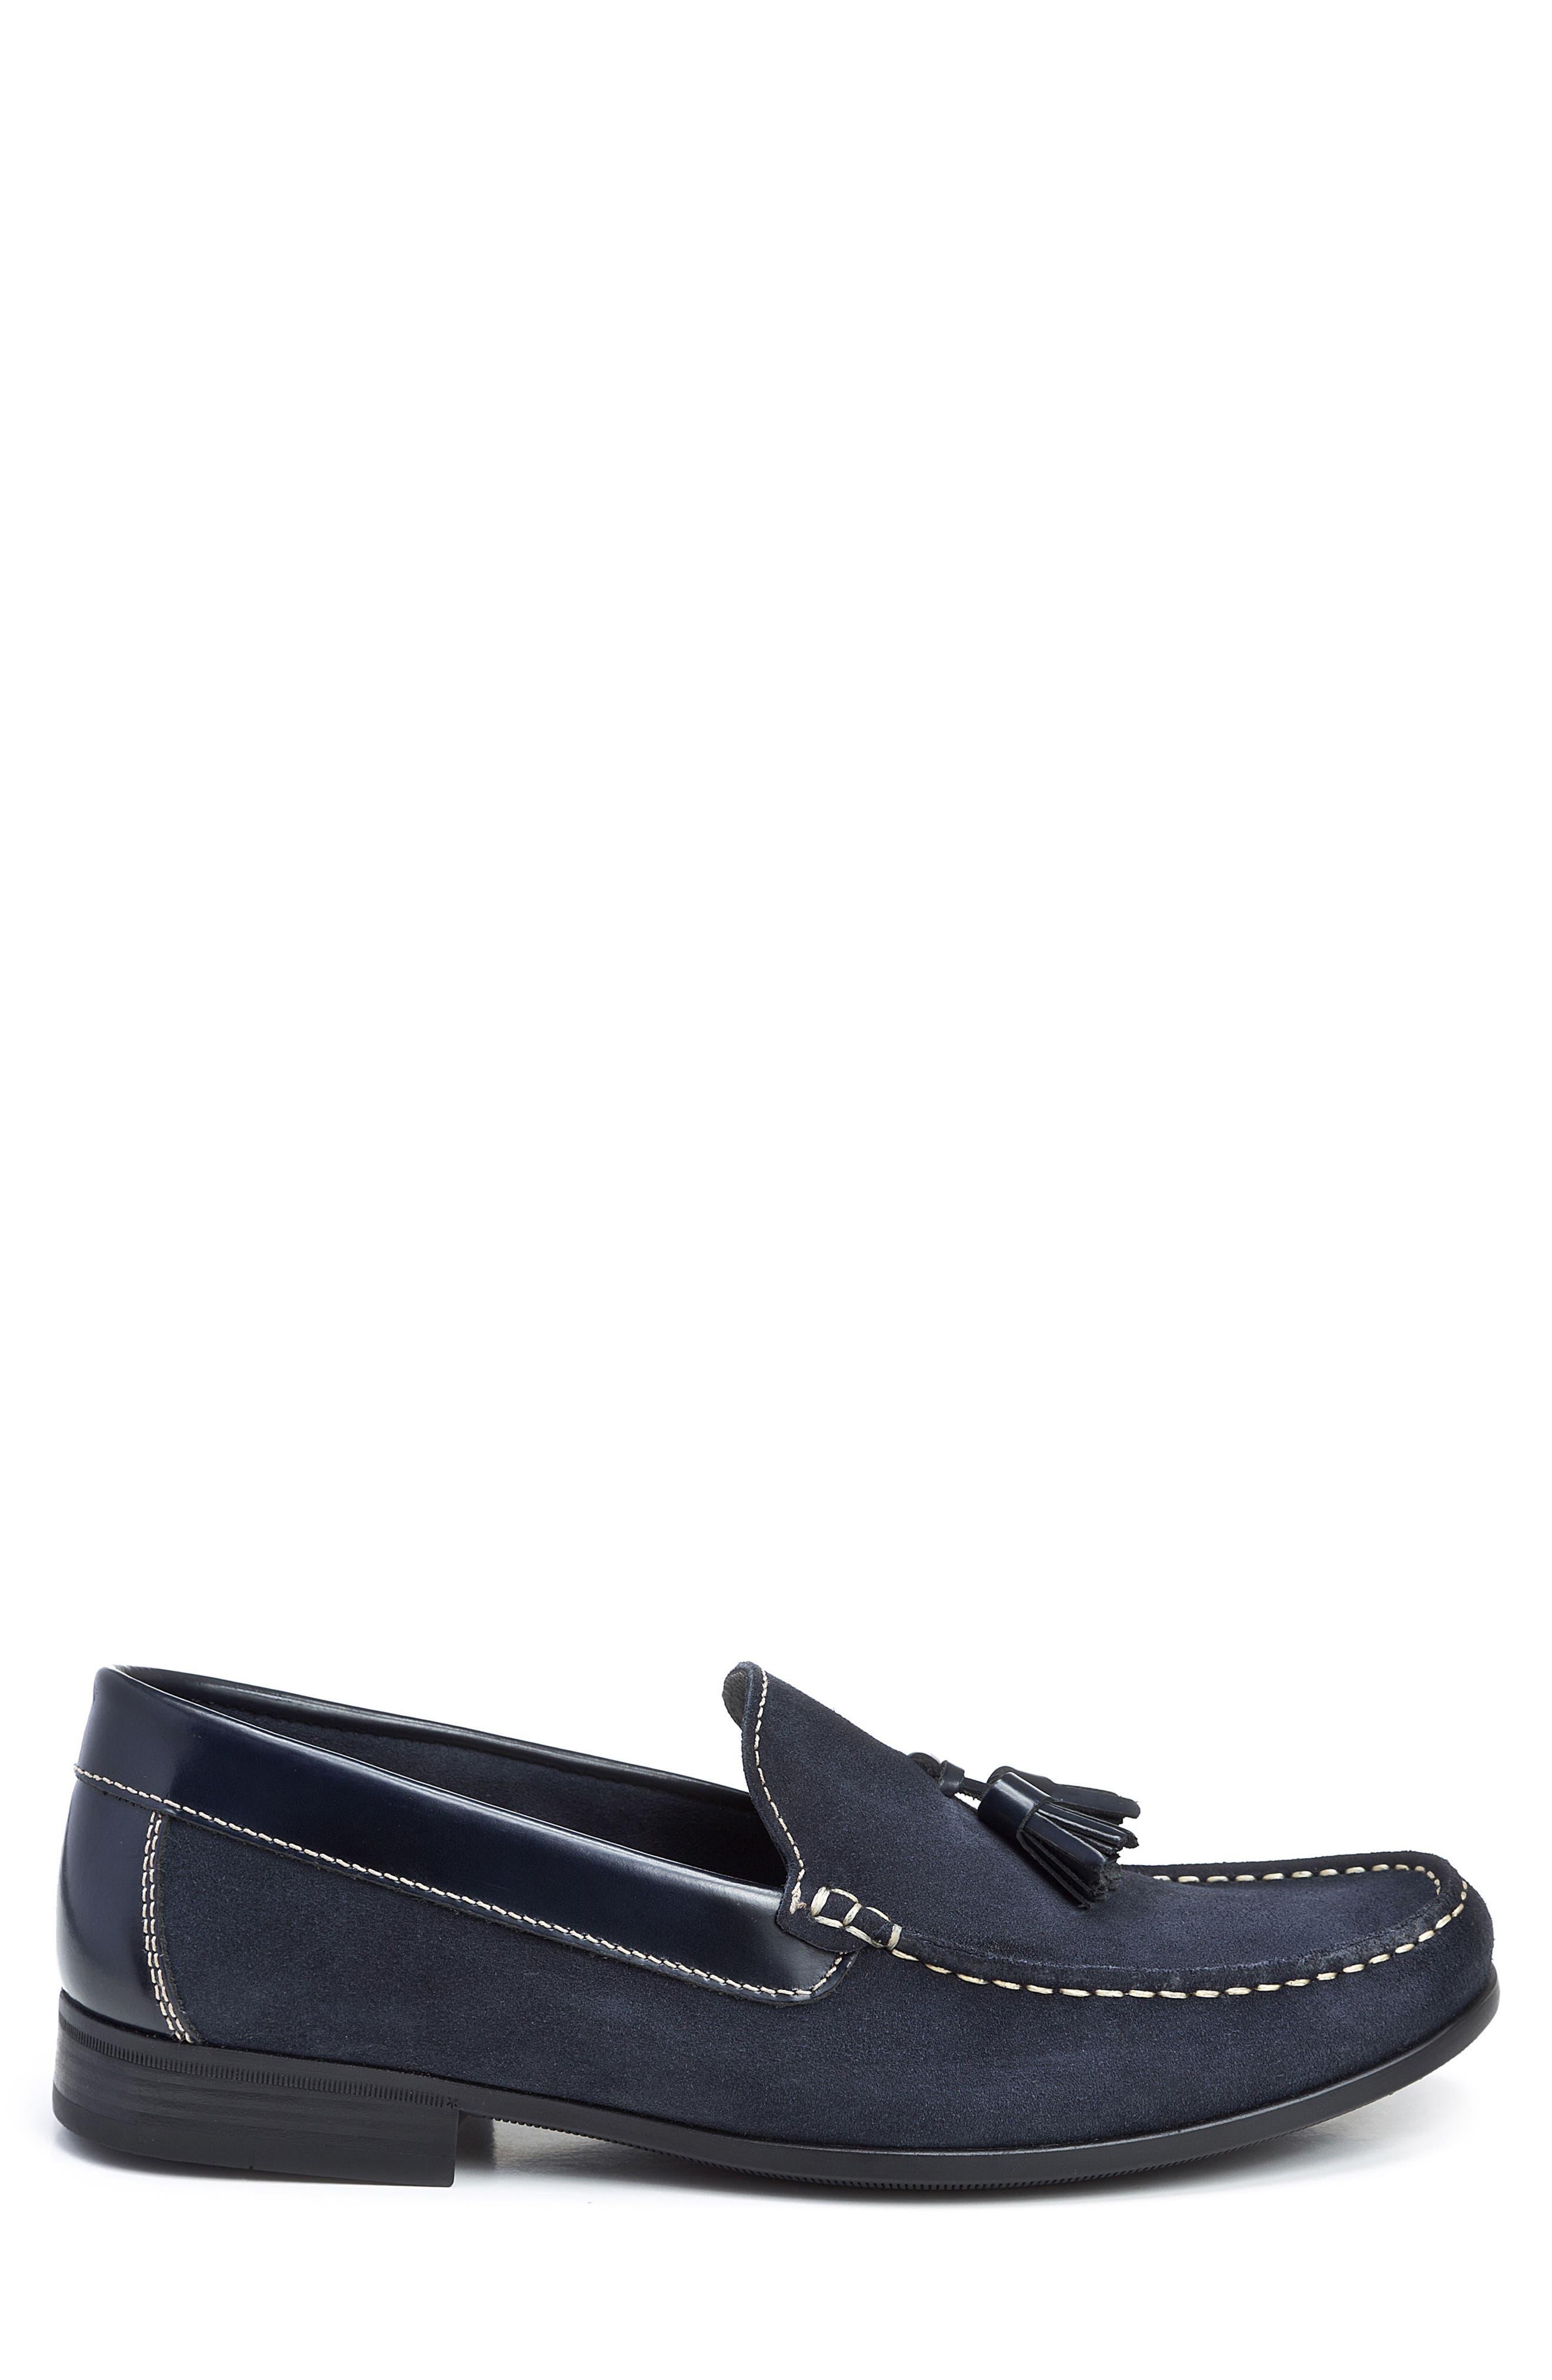 Hojas Tassel Loafer,                             Alternate thumbnail 3, color,                             Navy Leather